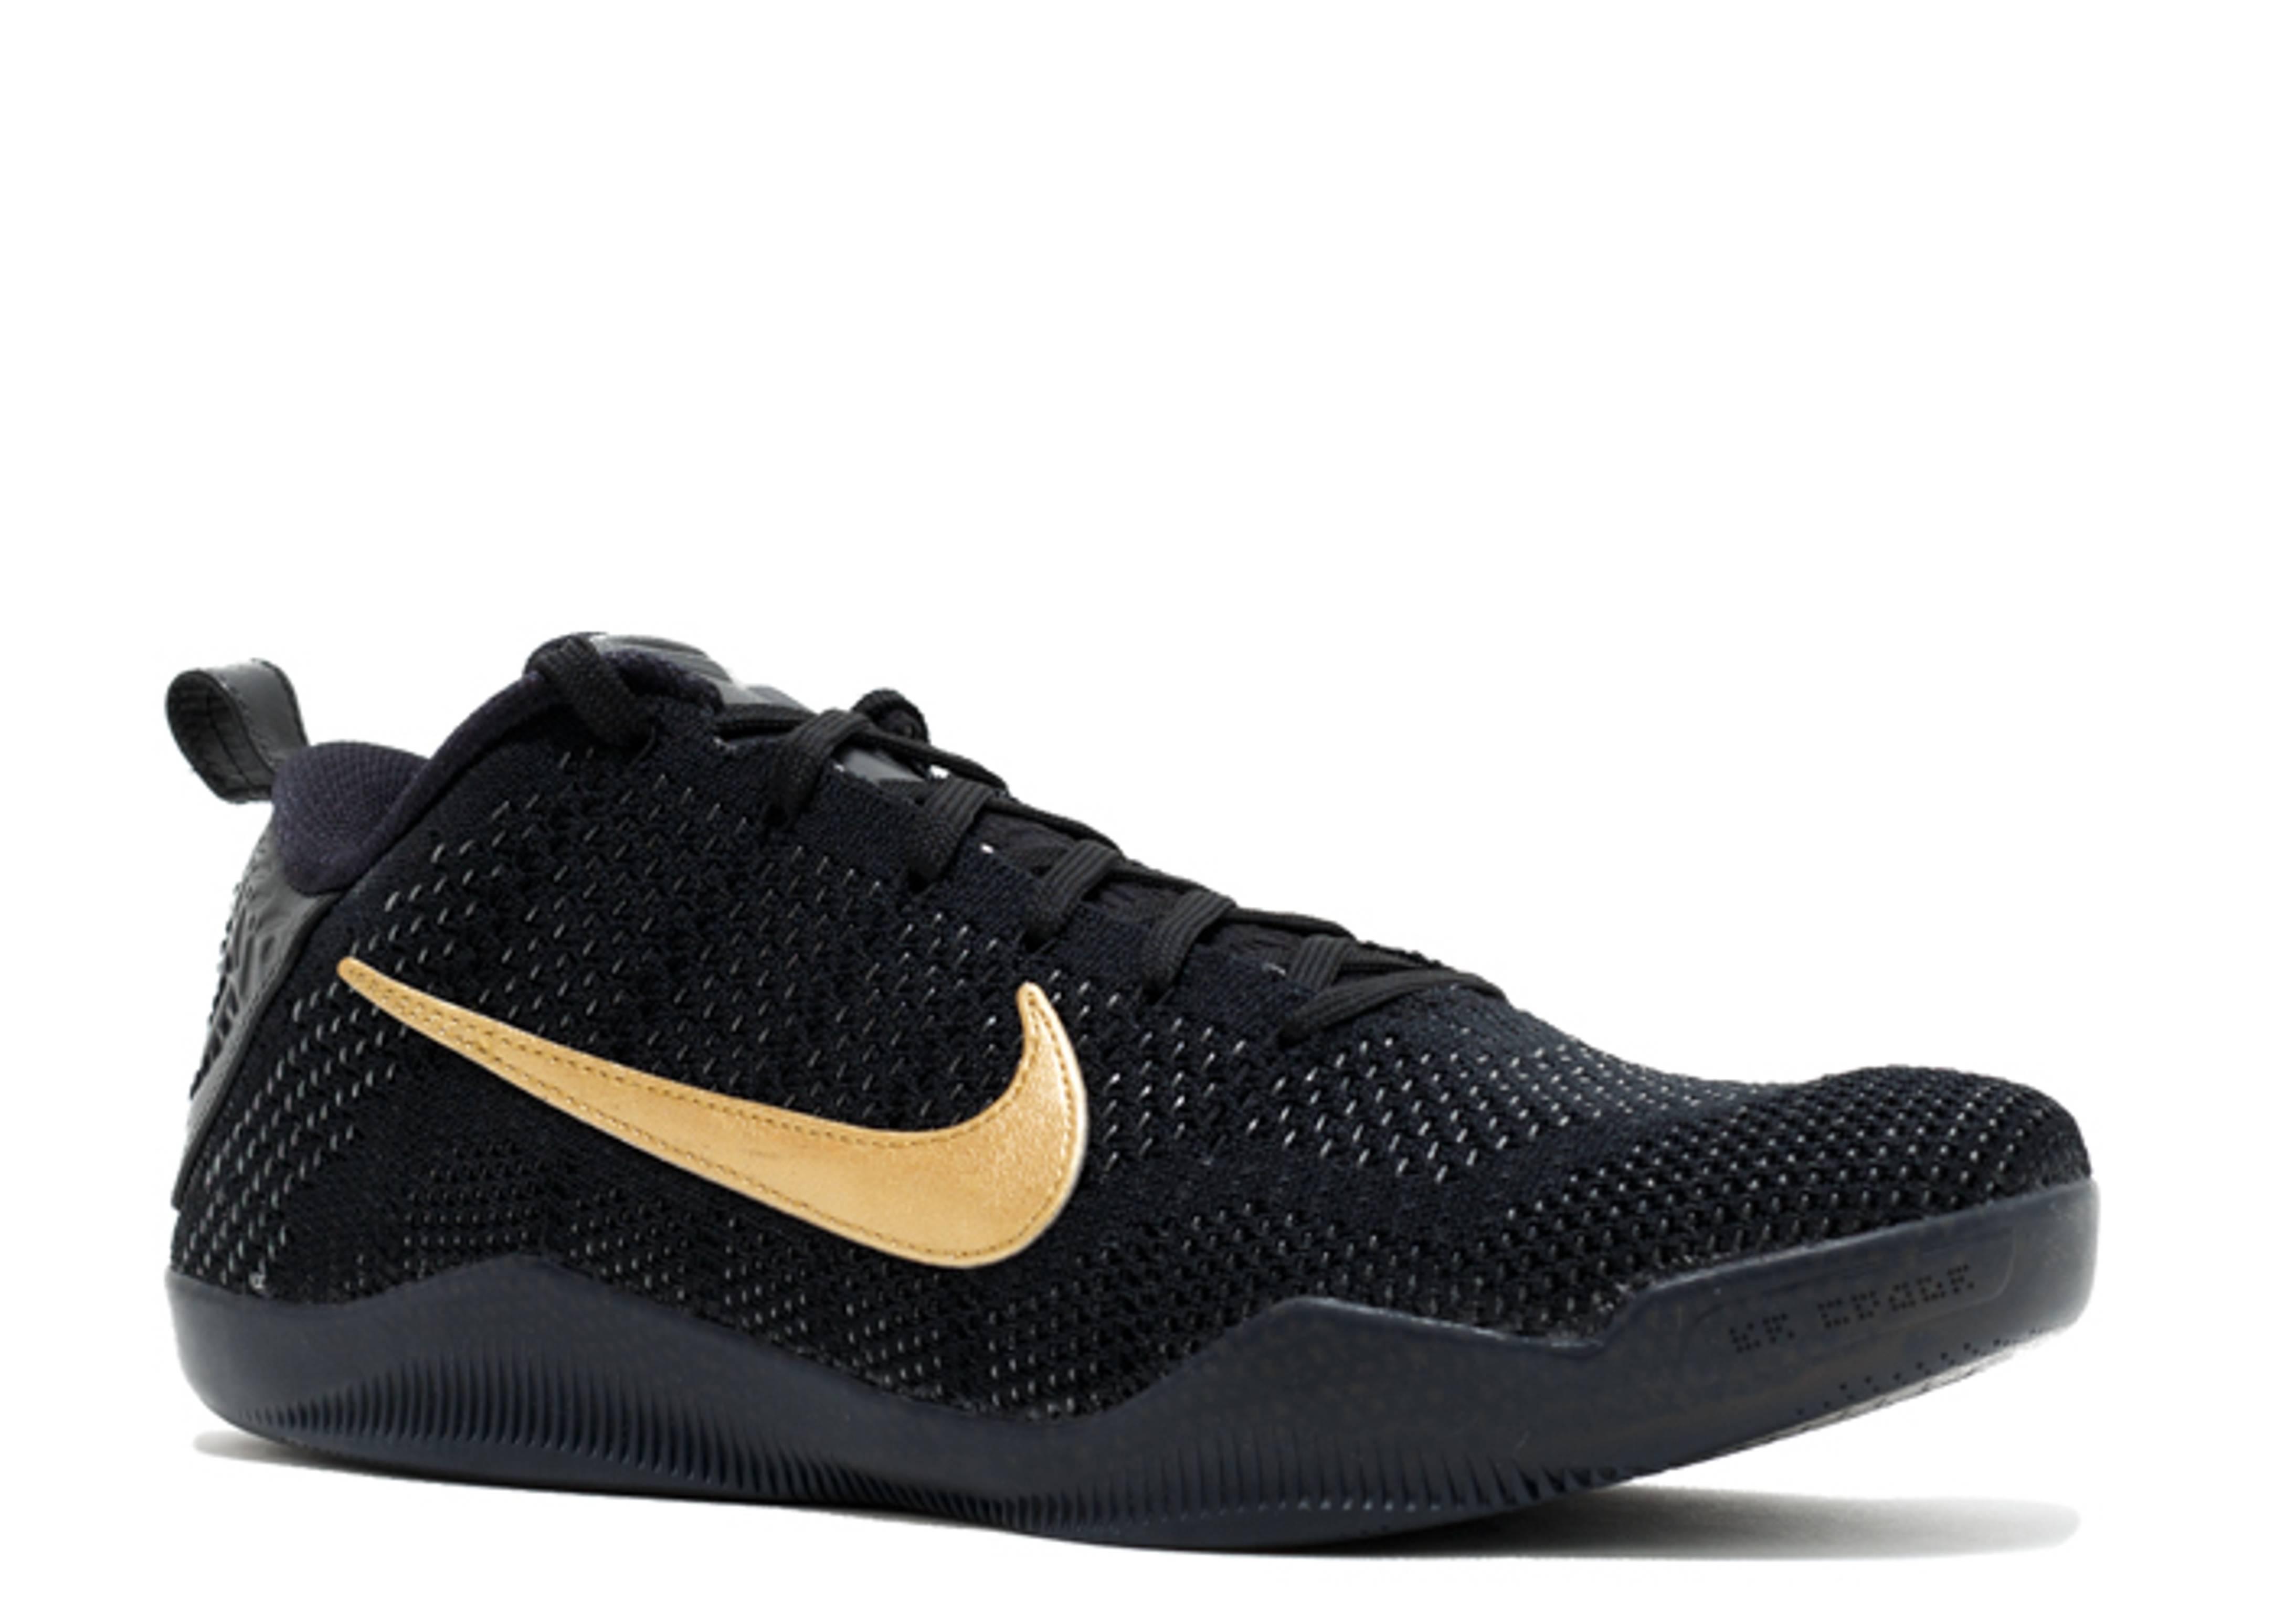 Nike Kobe 10 Green Vino Release Date